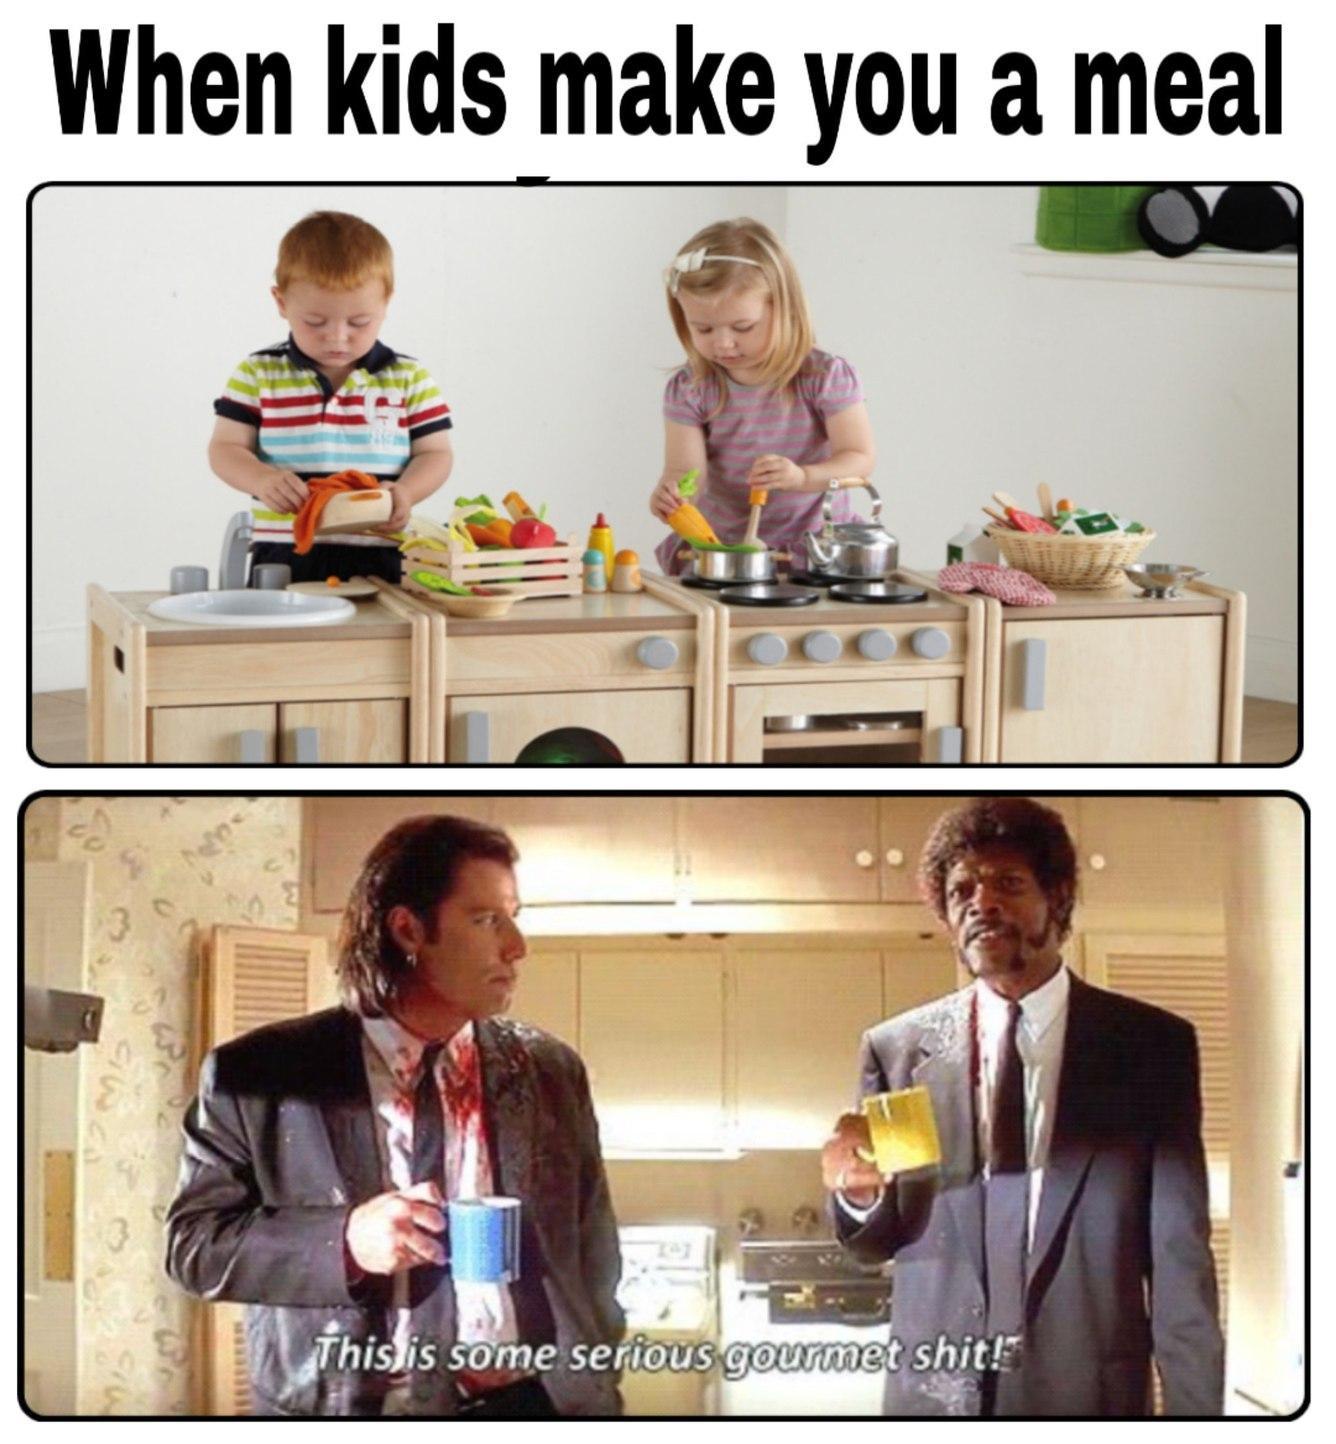 Gourmet shit - meme